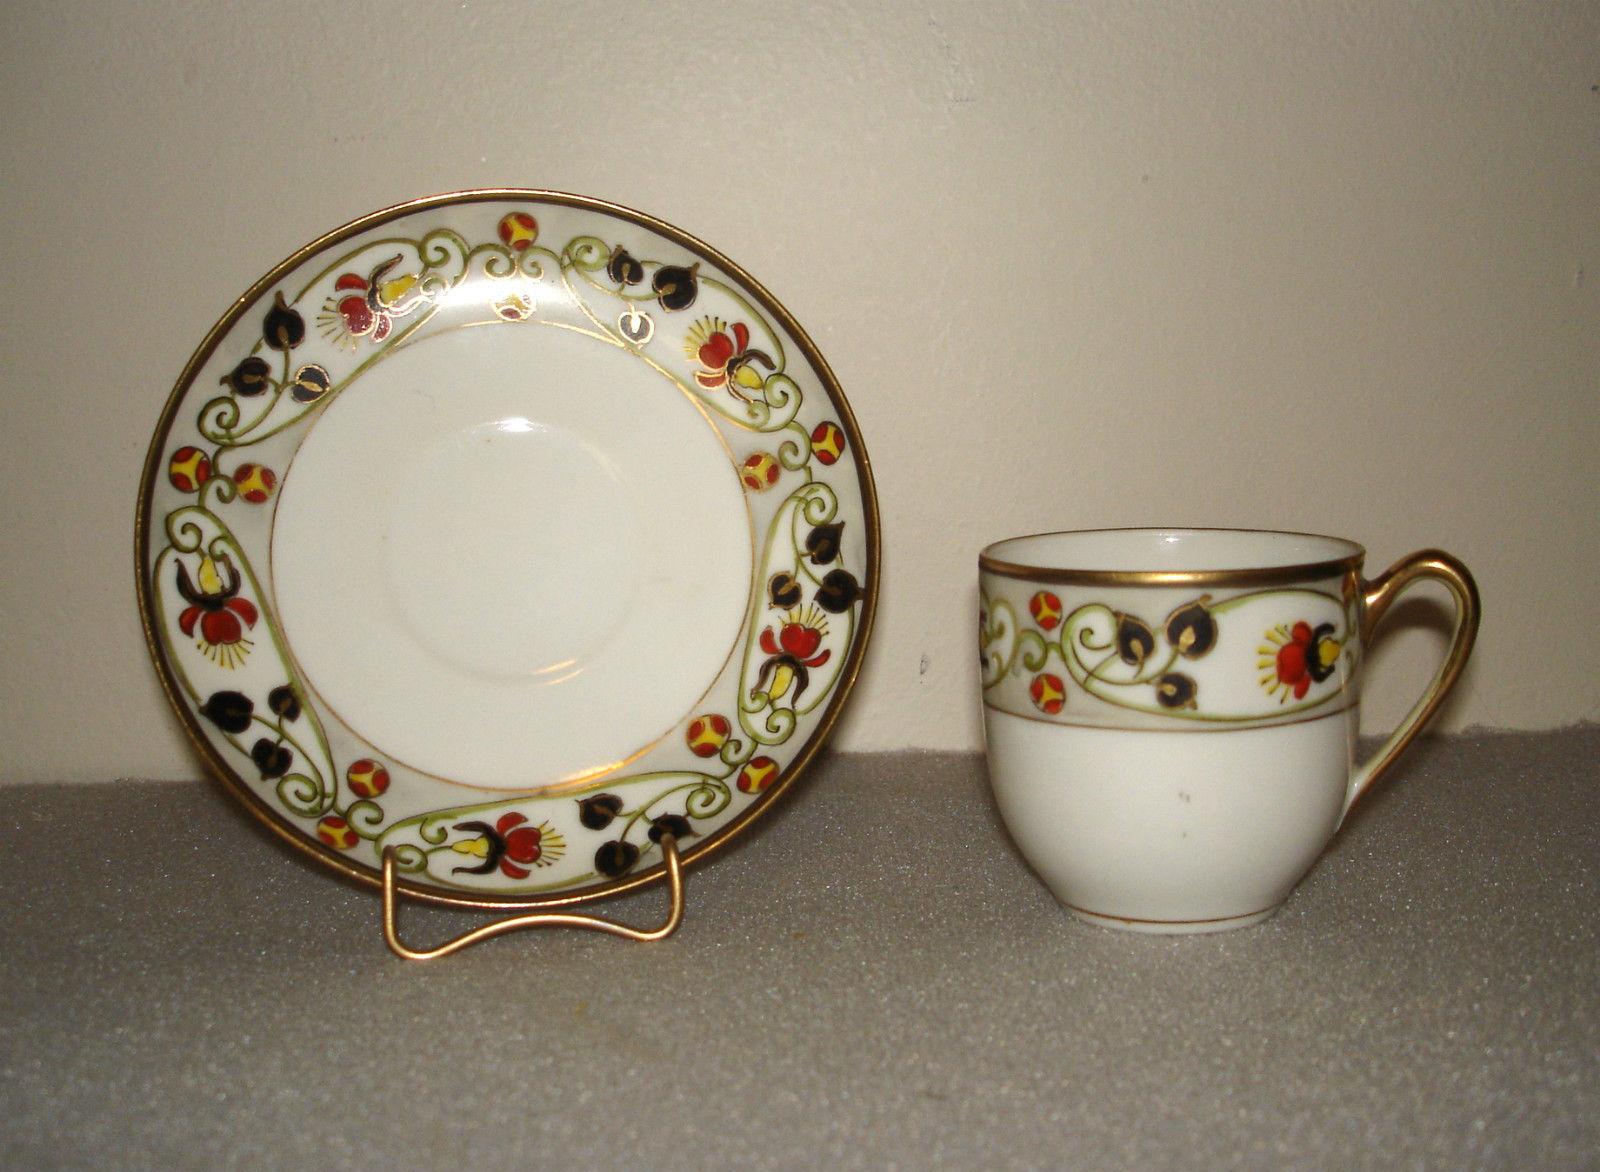 Vintage Nippon Hand Painted Porcelain Demitasse Cup & Saucer